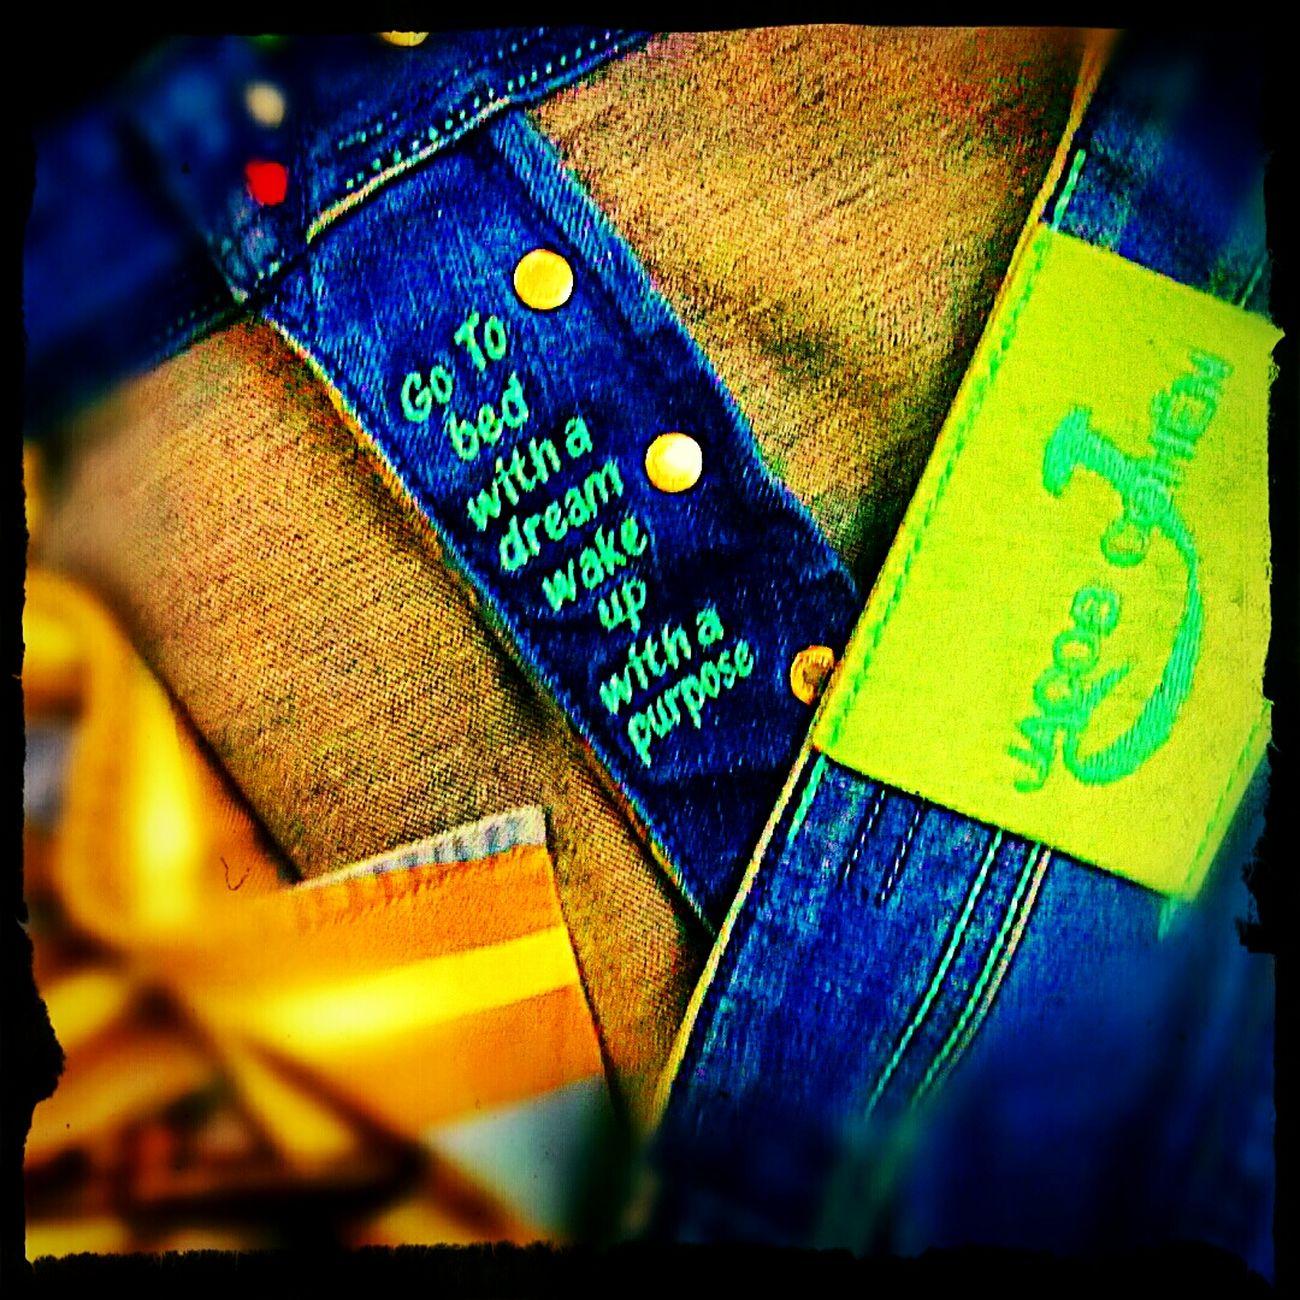 Jacobcohen Jeans KotaBharu